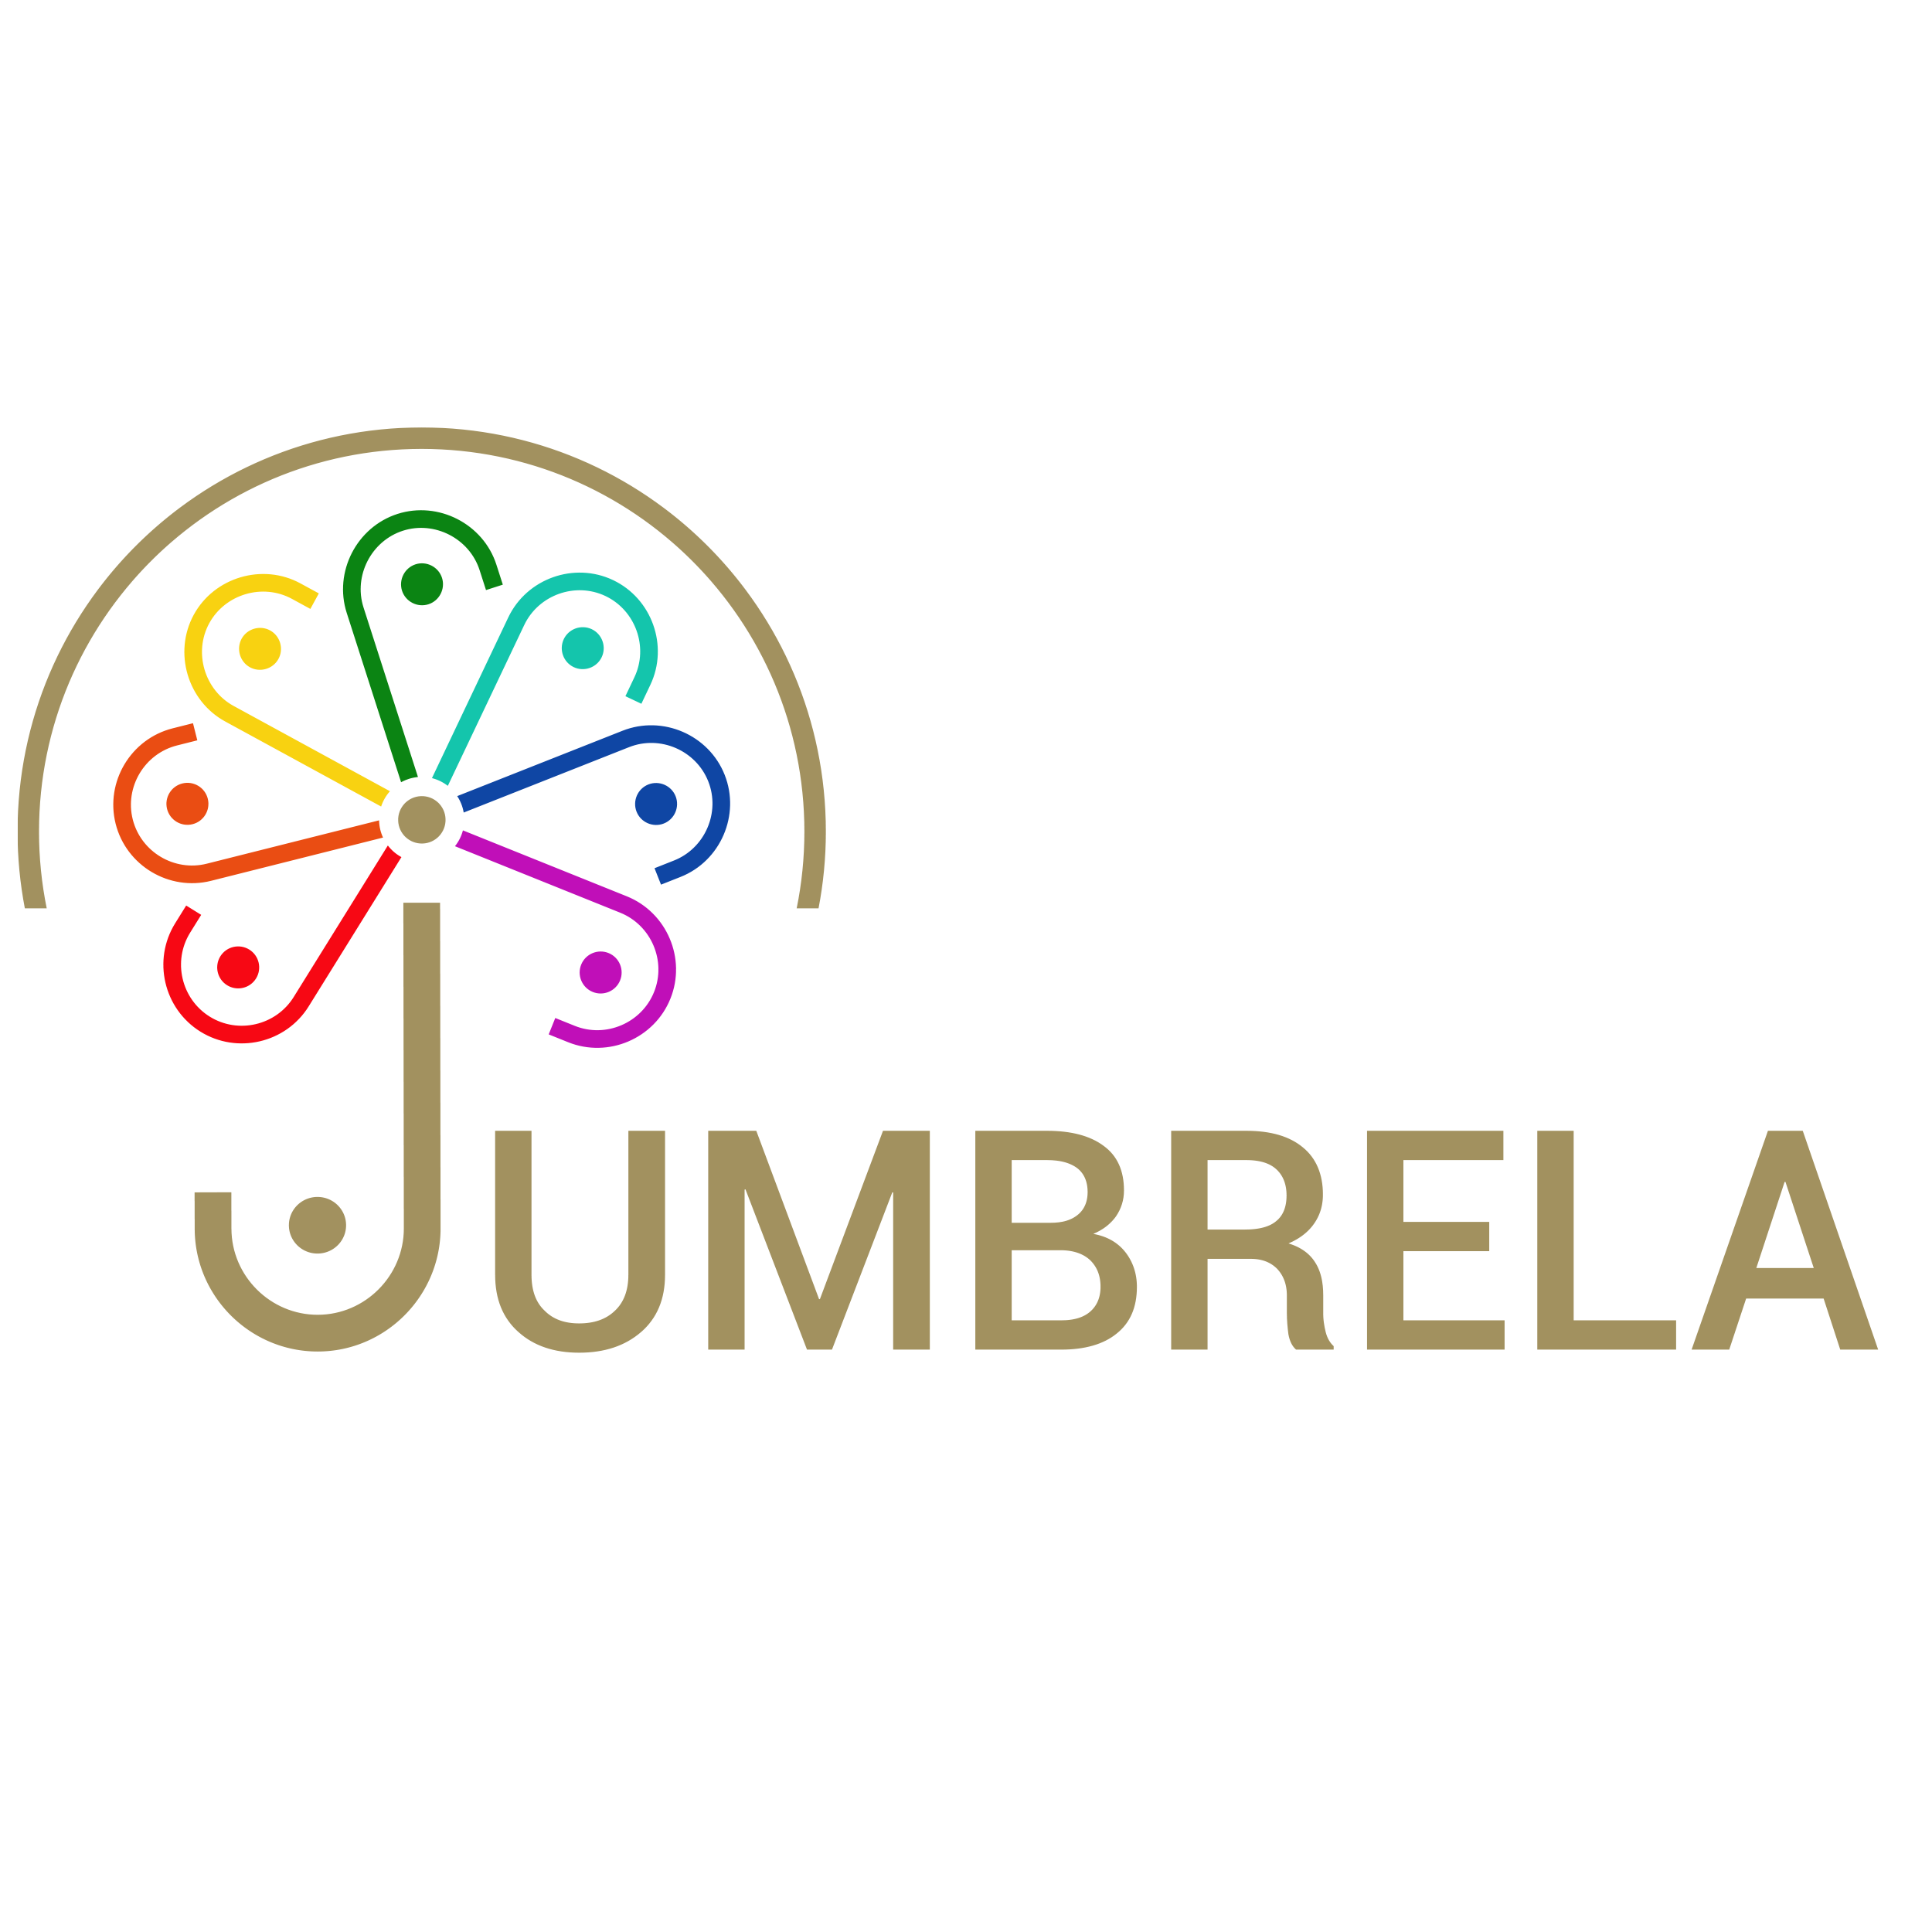 jumbrela-malaga-servizi-marketing-business